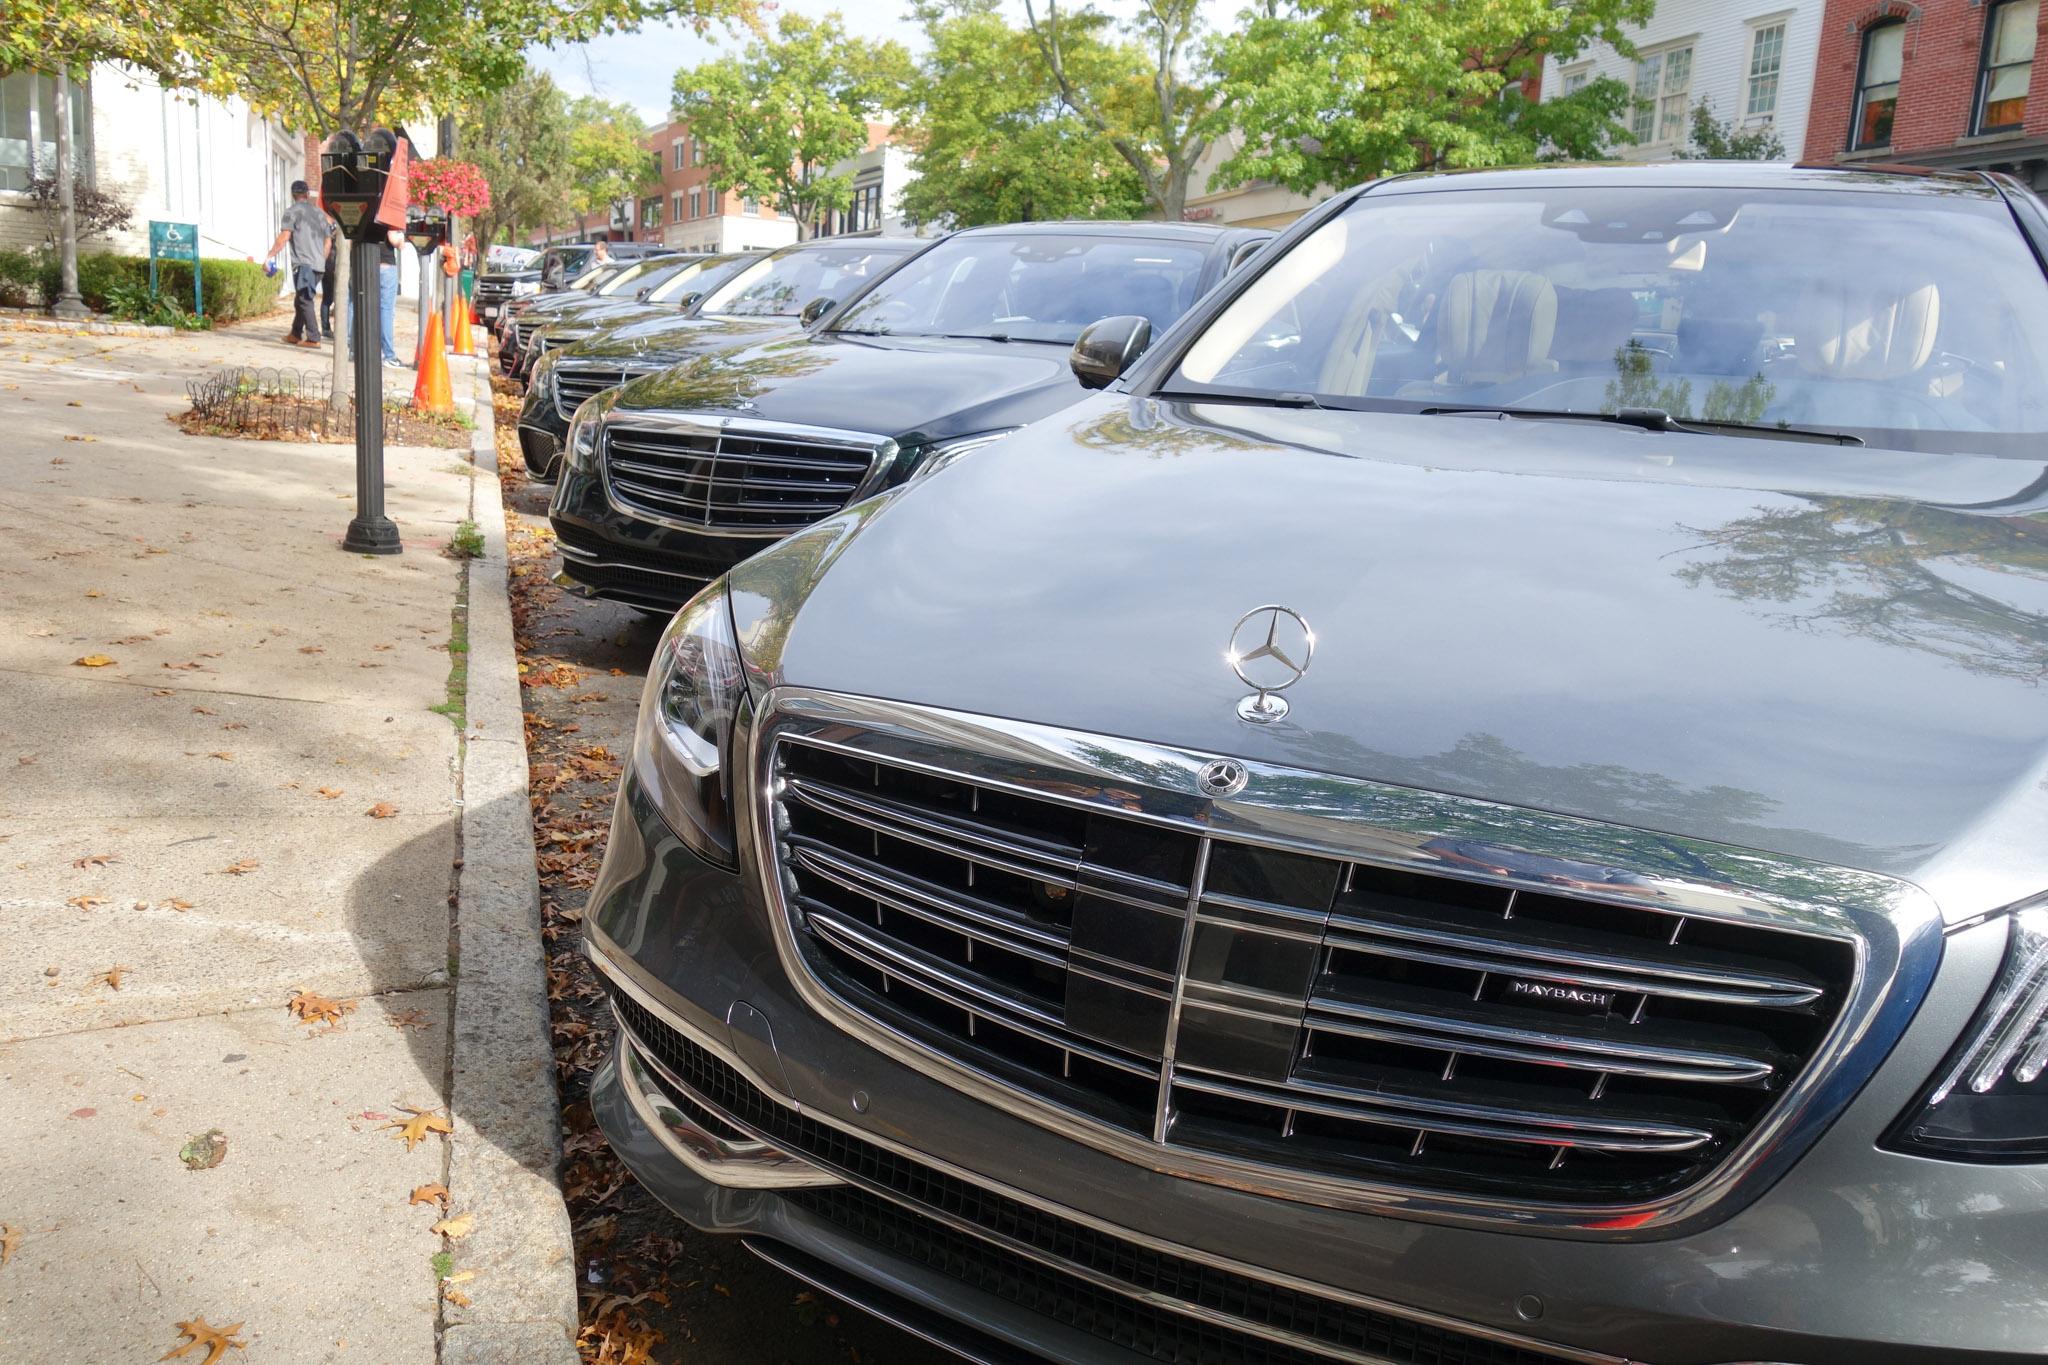 https://st.automobilemag.com/uploads/sites/11/2017/10/2018-Mercedes-Benz-and-Mercedes-AMG-S-Class-Sedan-Greenwich-.jpg